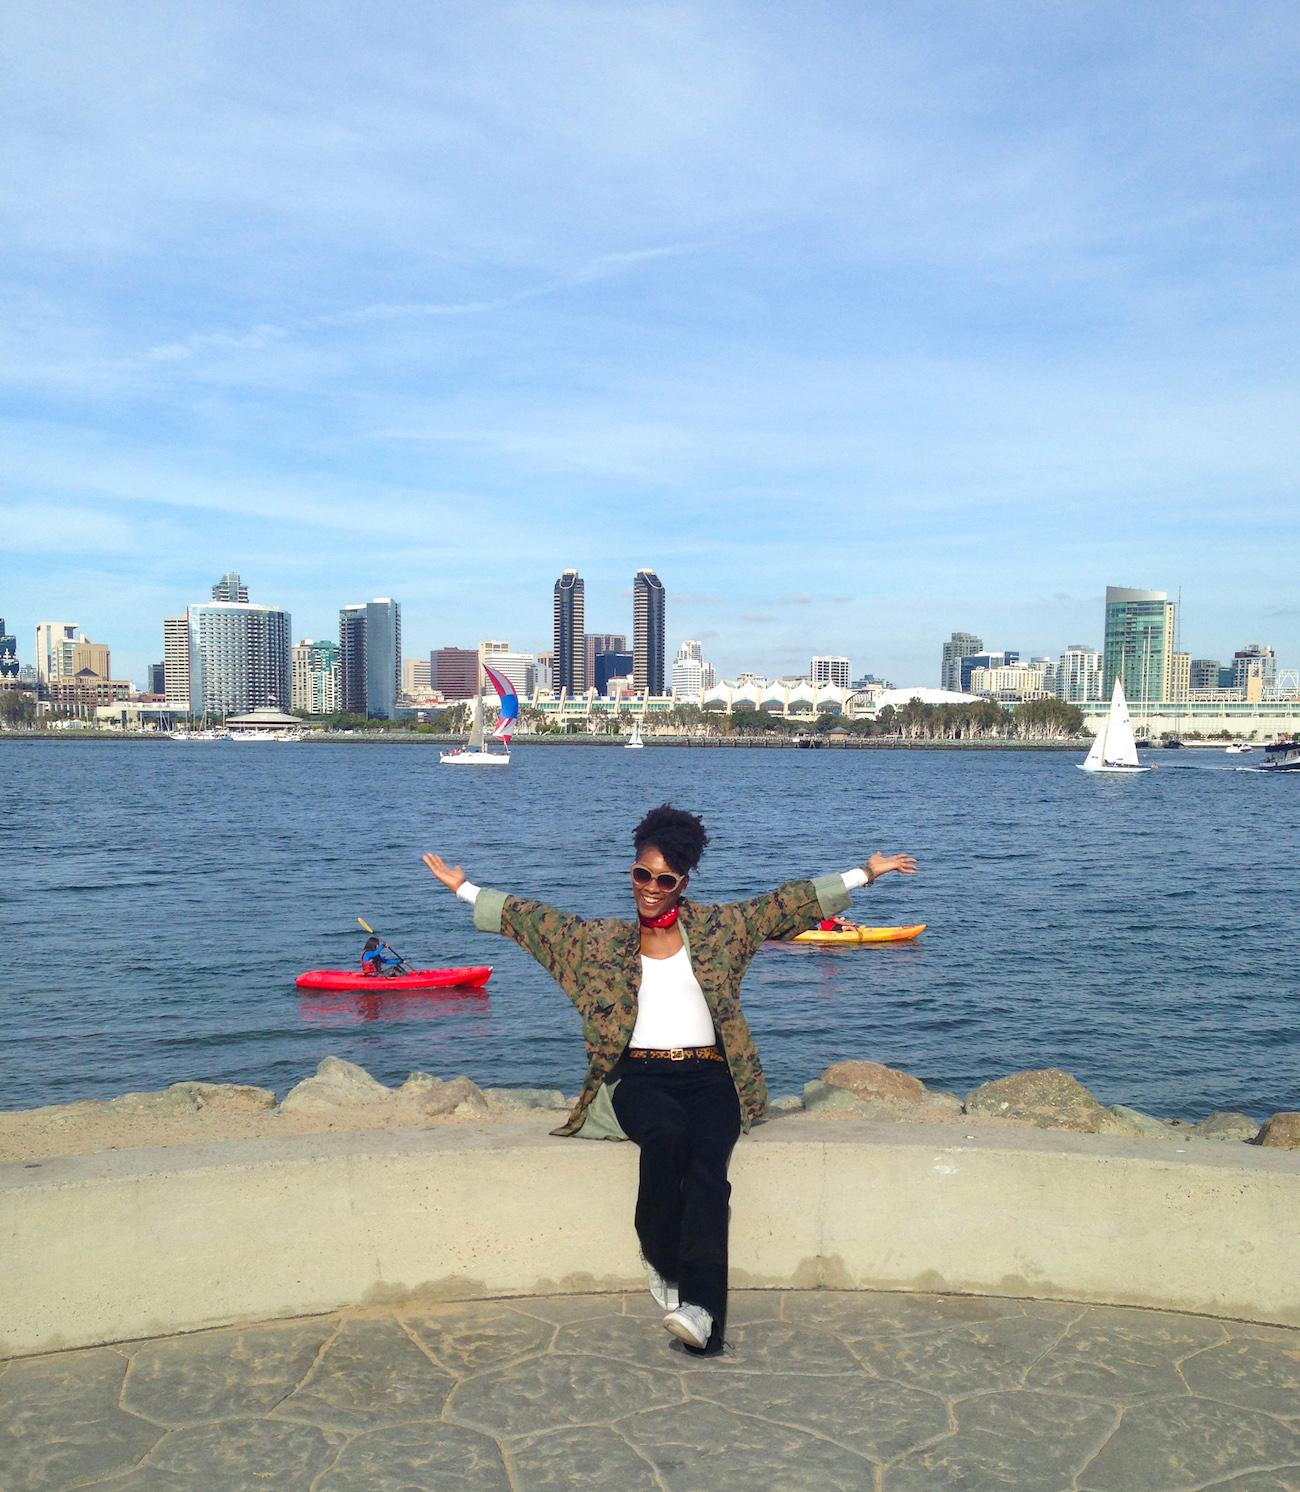 san diego Coronado island